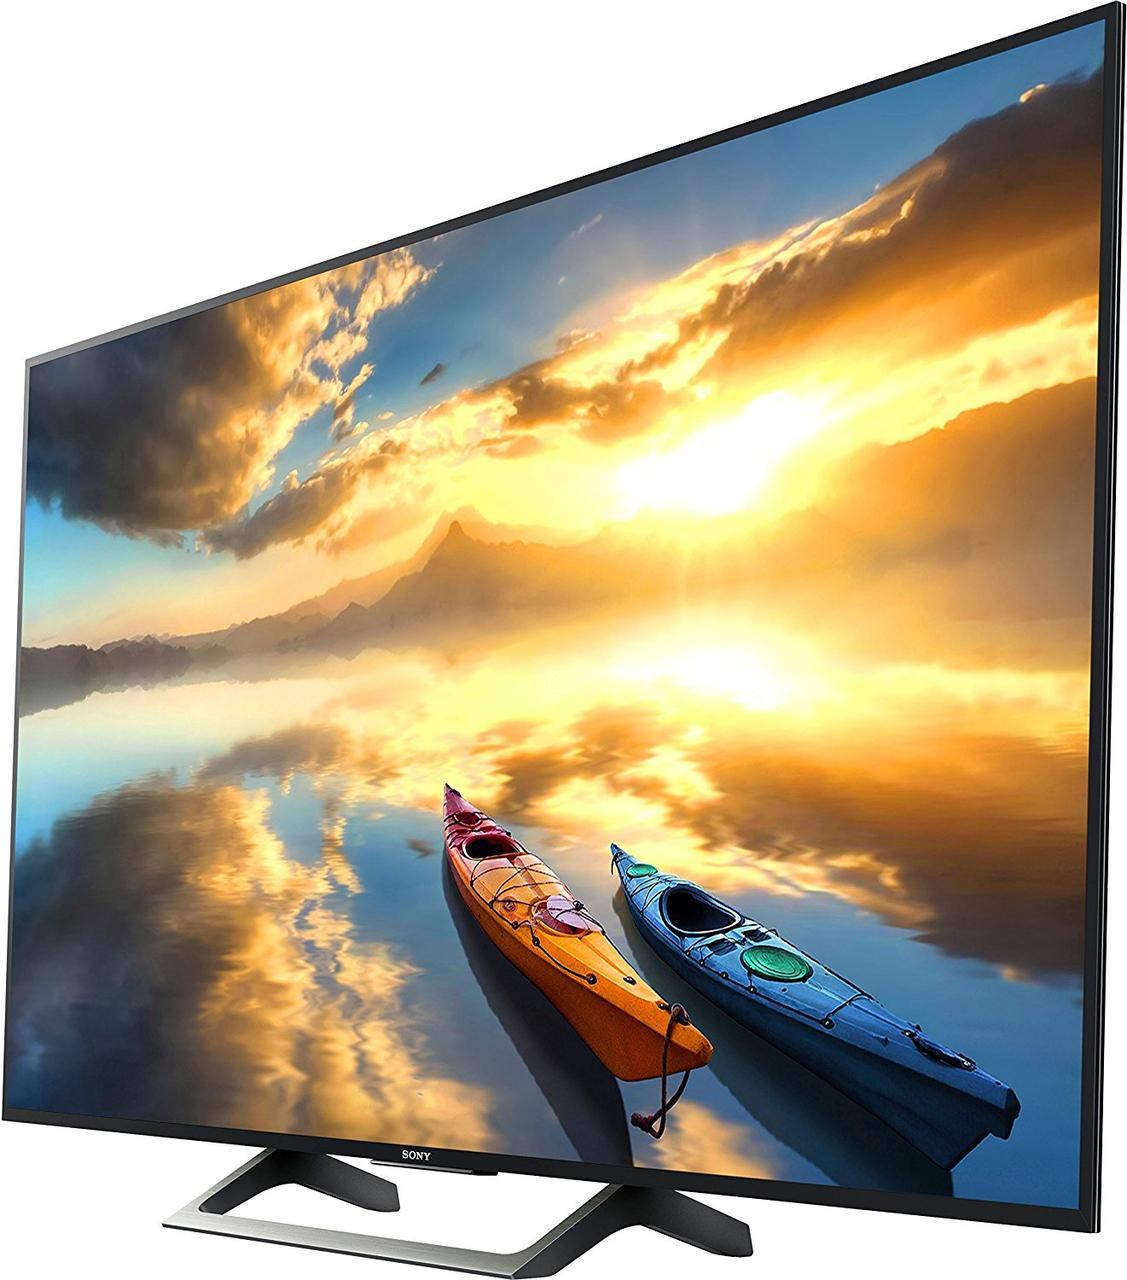 Телевизор Sony KD-55XE7004 (MXR200Гц,UltraHD4K,Smart, HDR, 4K X-RealityPRO, Live Colour, Dolby Digital 20Вт), фото 4